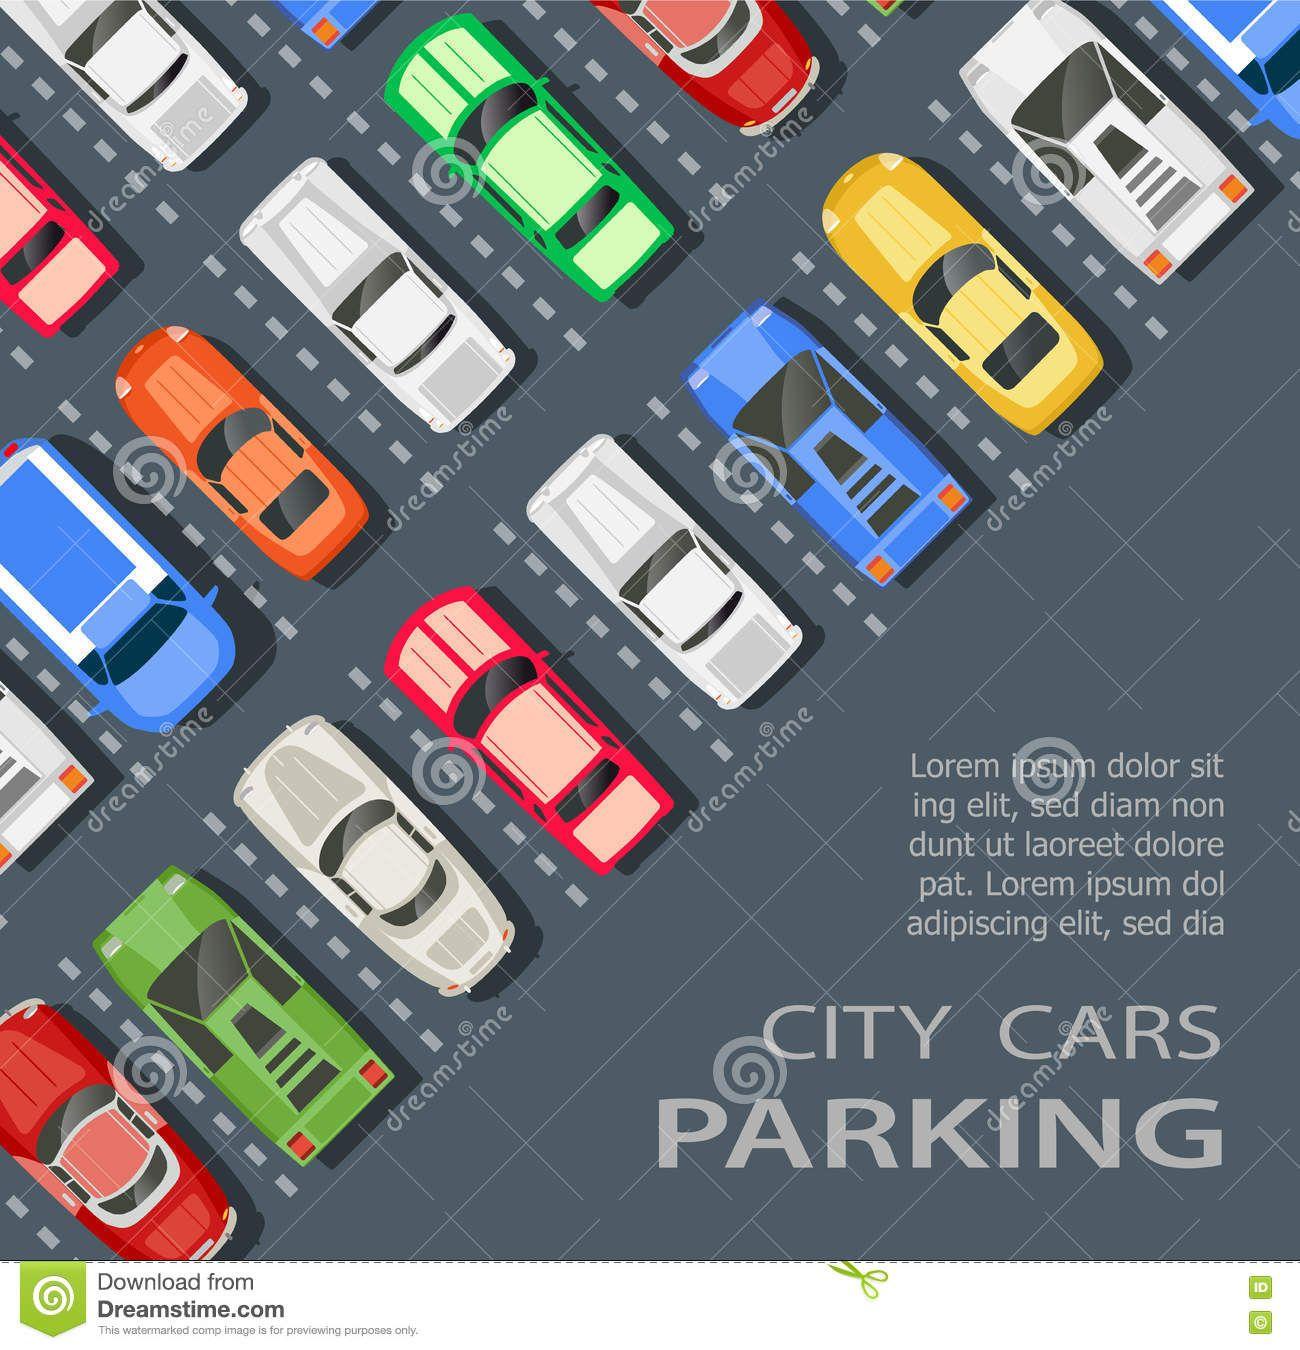 Business team cartoon characters cartoon vector cartoondealer com - Download Top View City Parking Cartoon Vector Via Cartoondealer Top View City Parking Lot Set